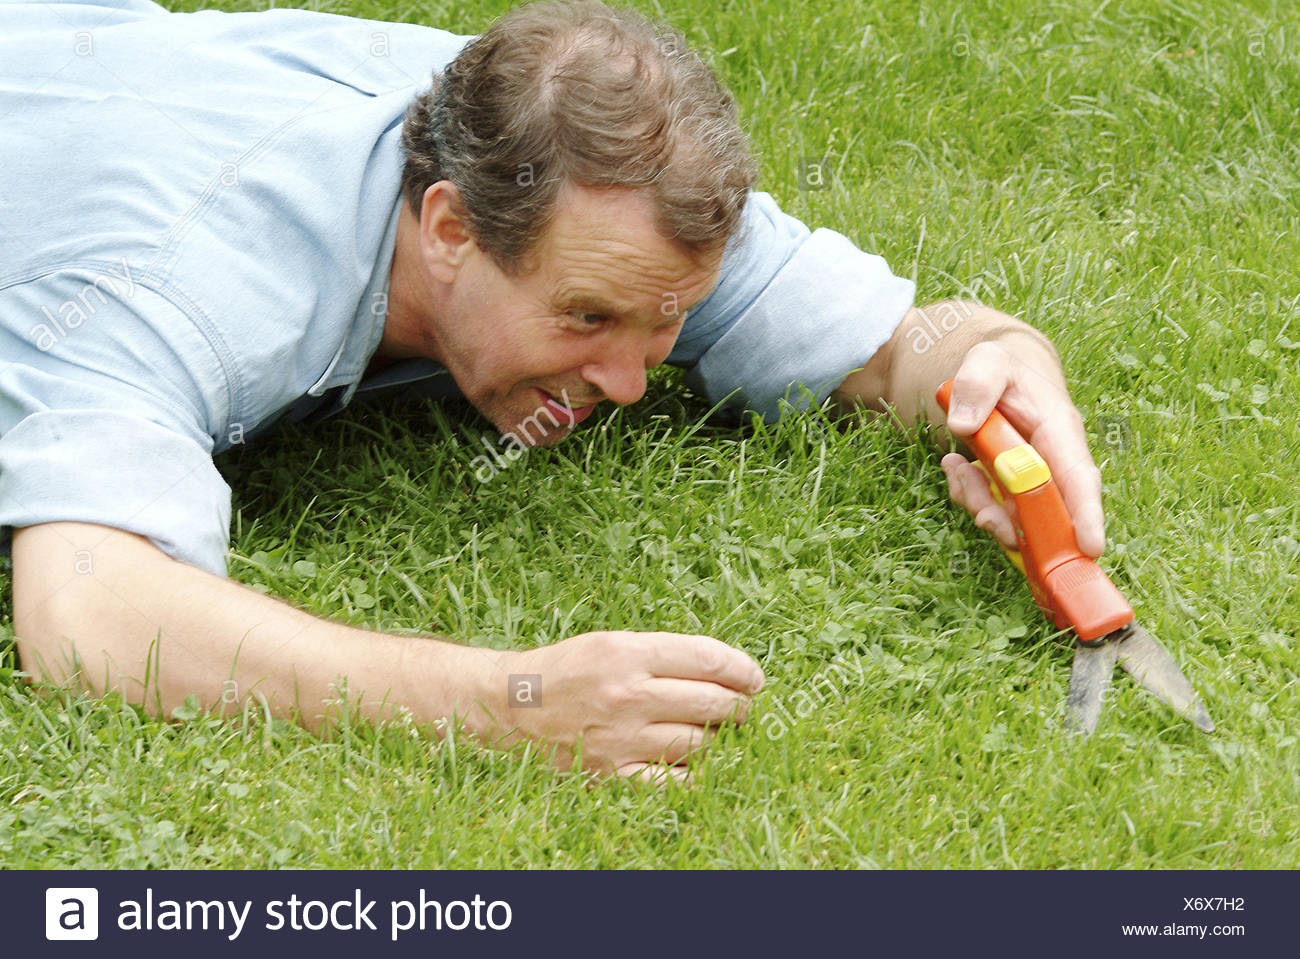 Turfs, man, lie, grass scissors, portrait, man's portrait, middle old person, 40-50 years, hobby, amateur gardener, gardener, garden, meadow, grass, blades grass, order, order-loving, order sense, excessively, pedant, Pedanterie, übergenau, exactly, accur - Stock Image